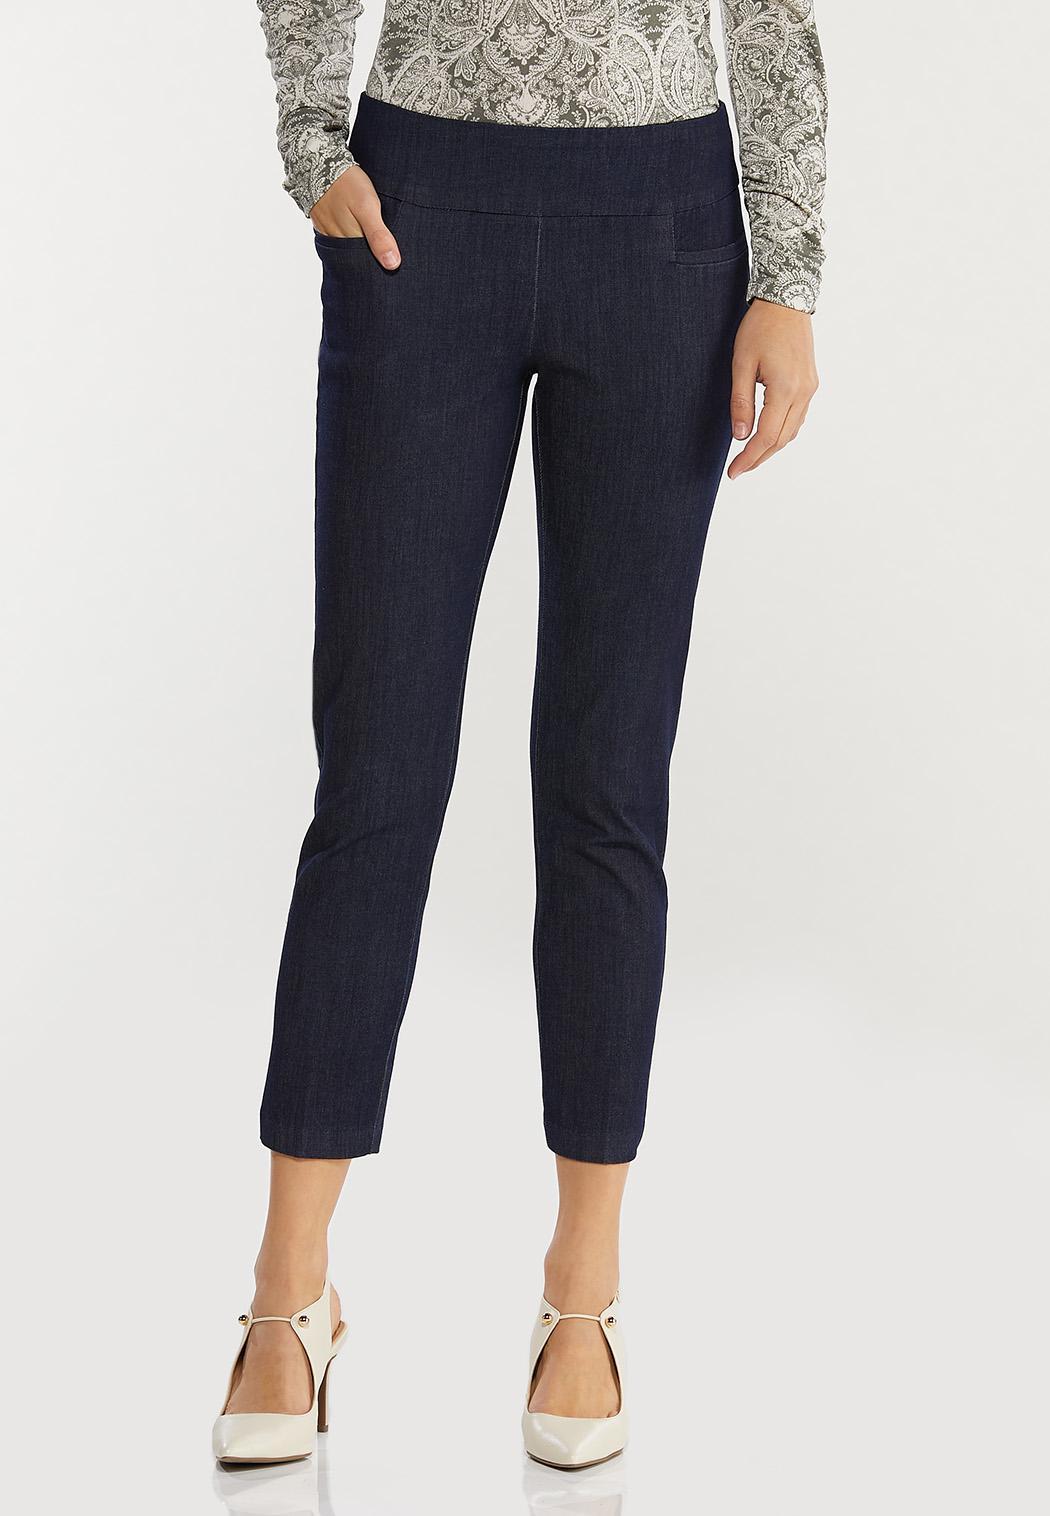 Dressy Ankle Pants